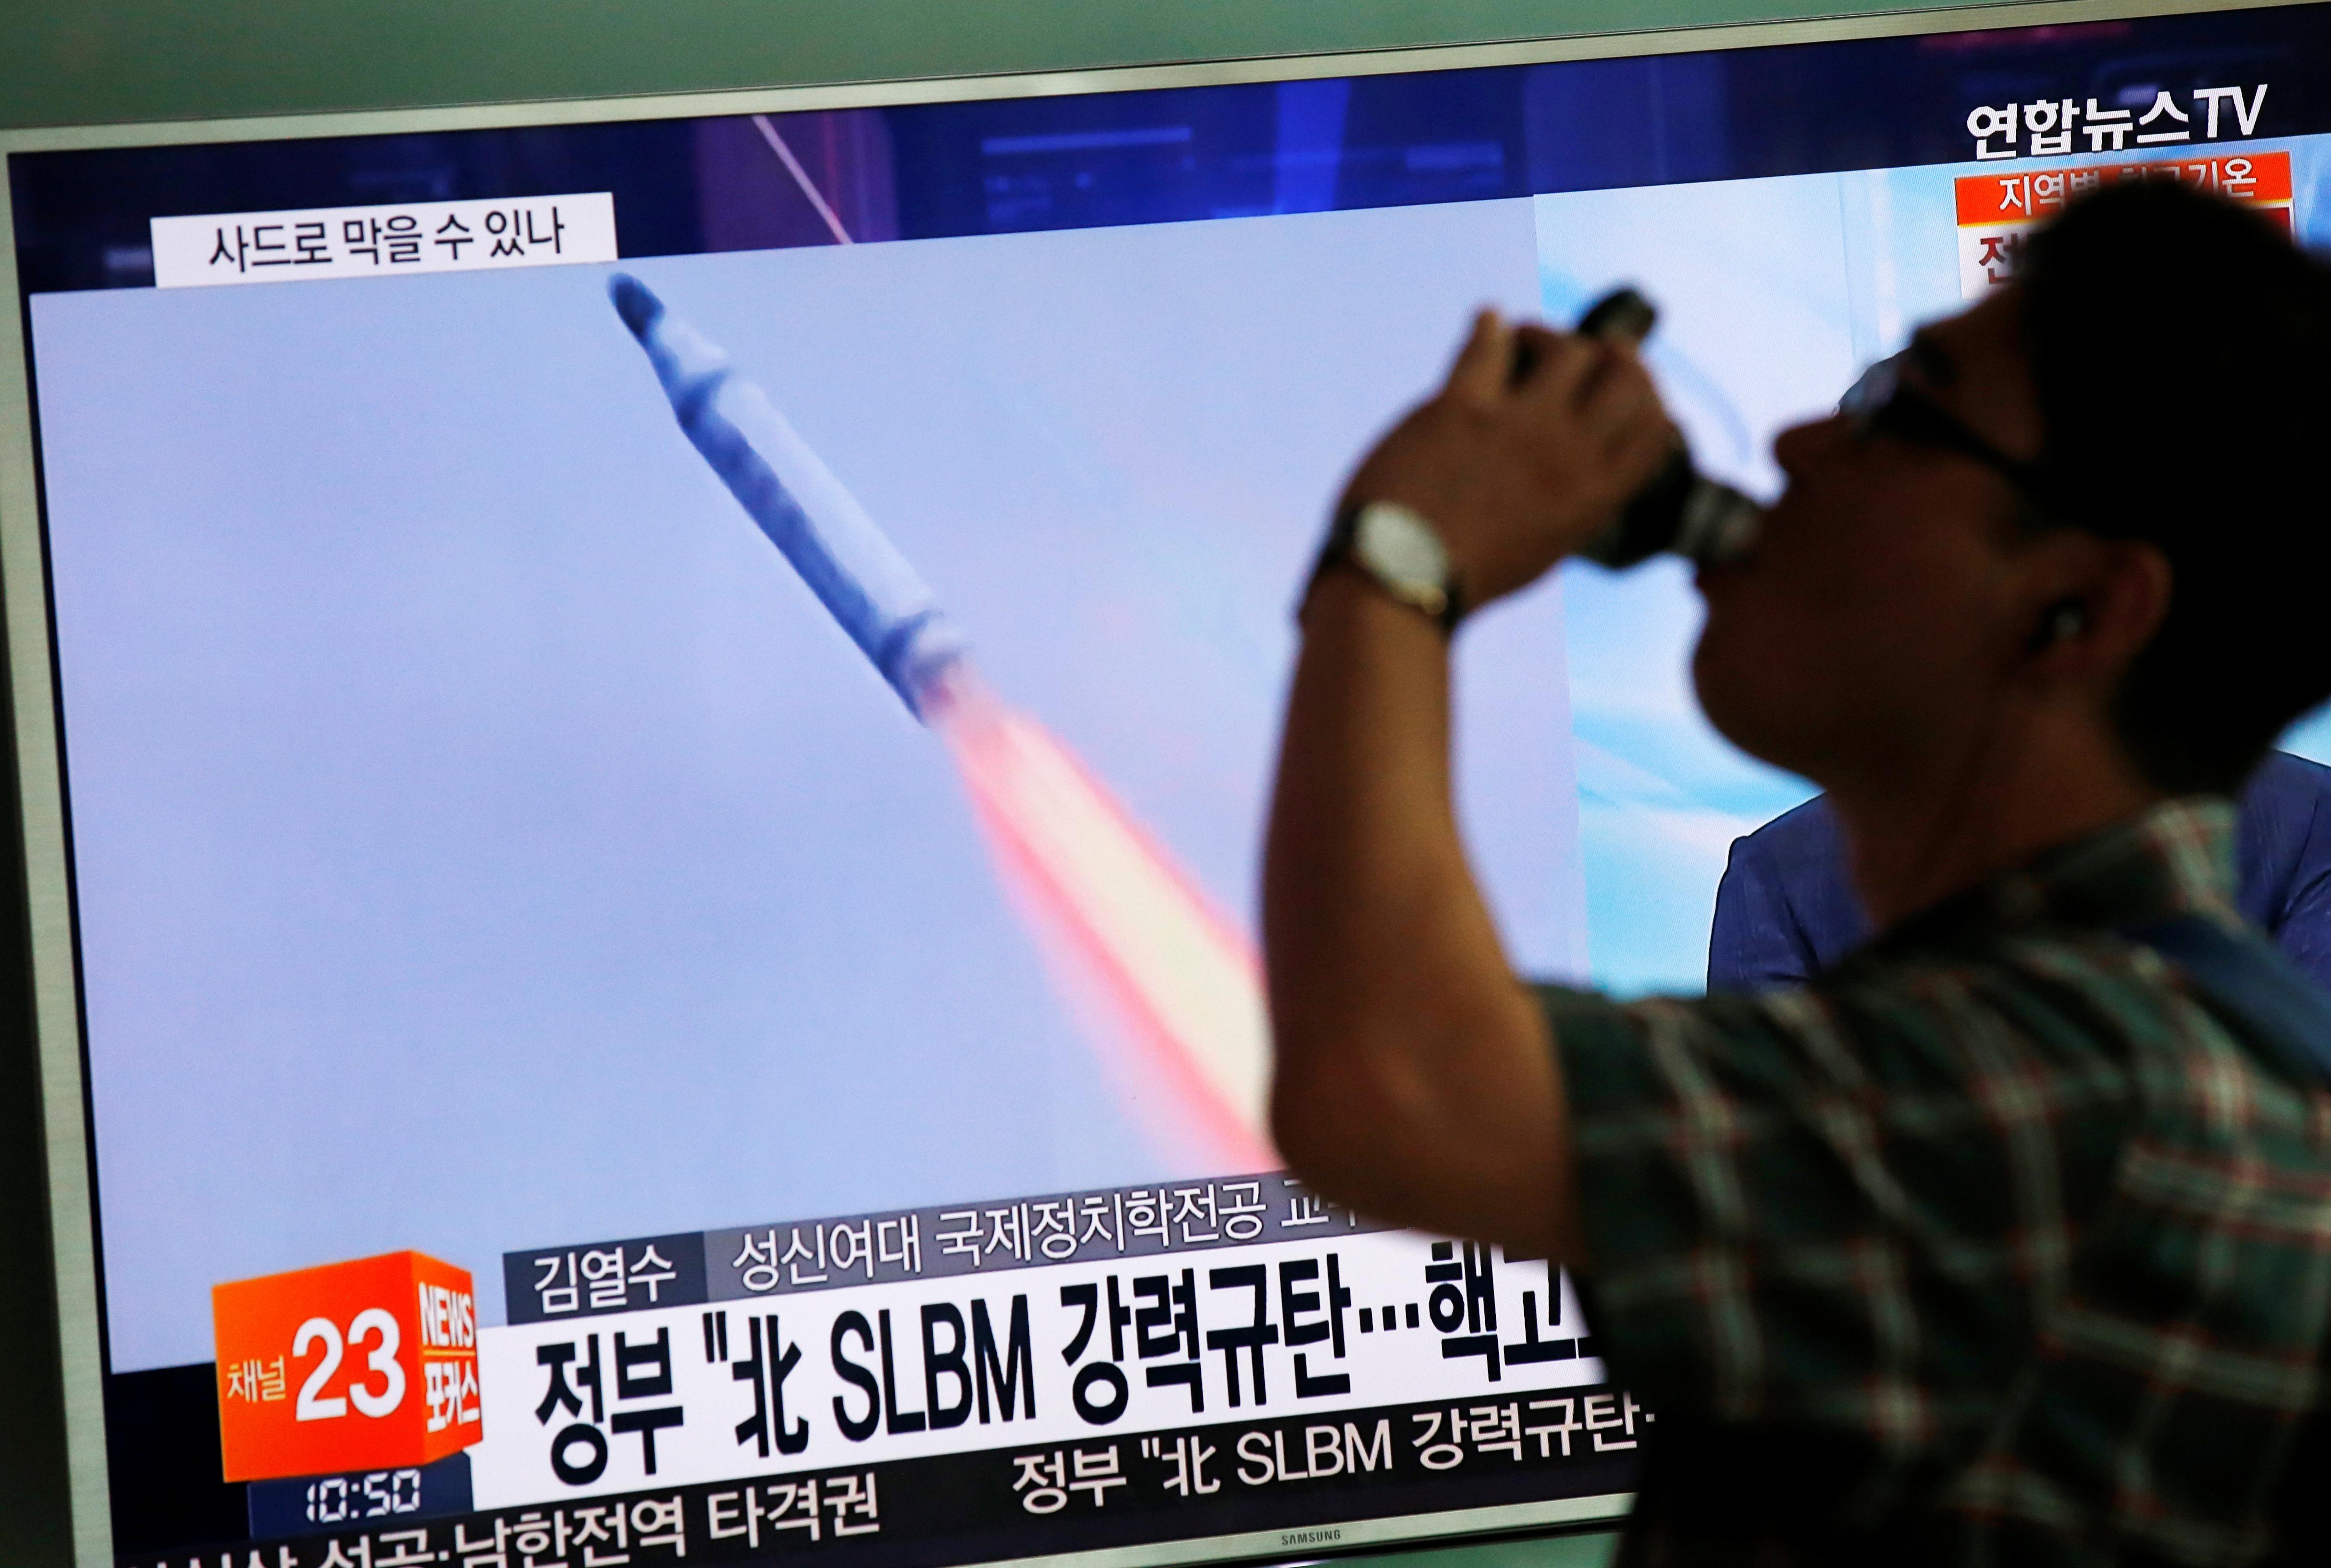 http://www.pri.org/sites/default/files/story/images/nukes-nkorea.jpg